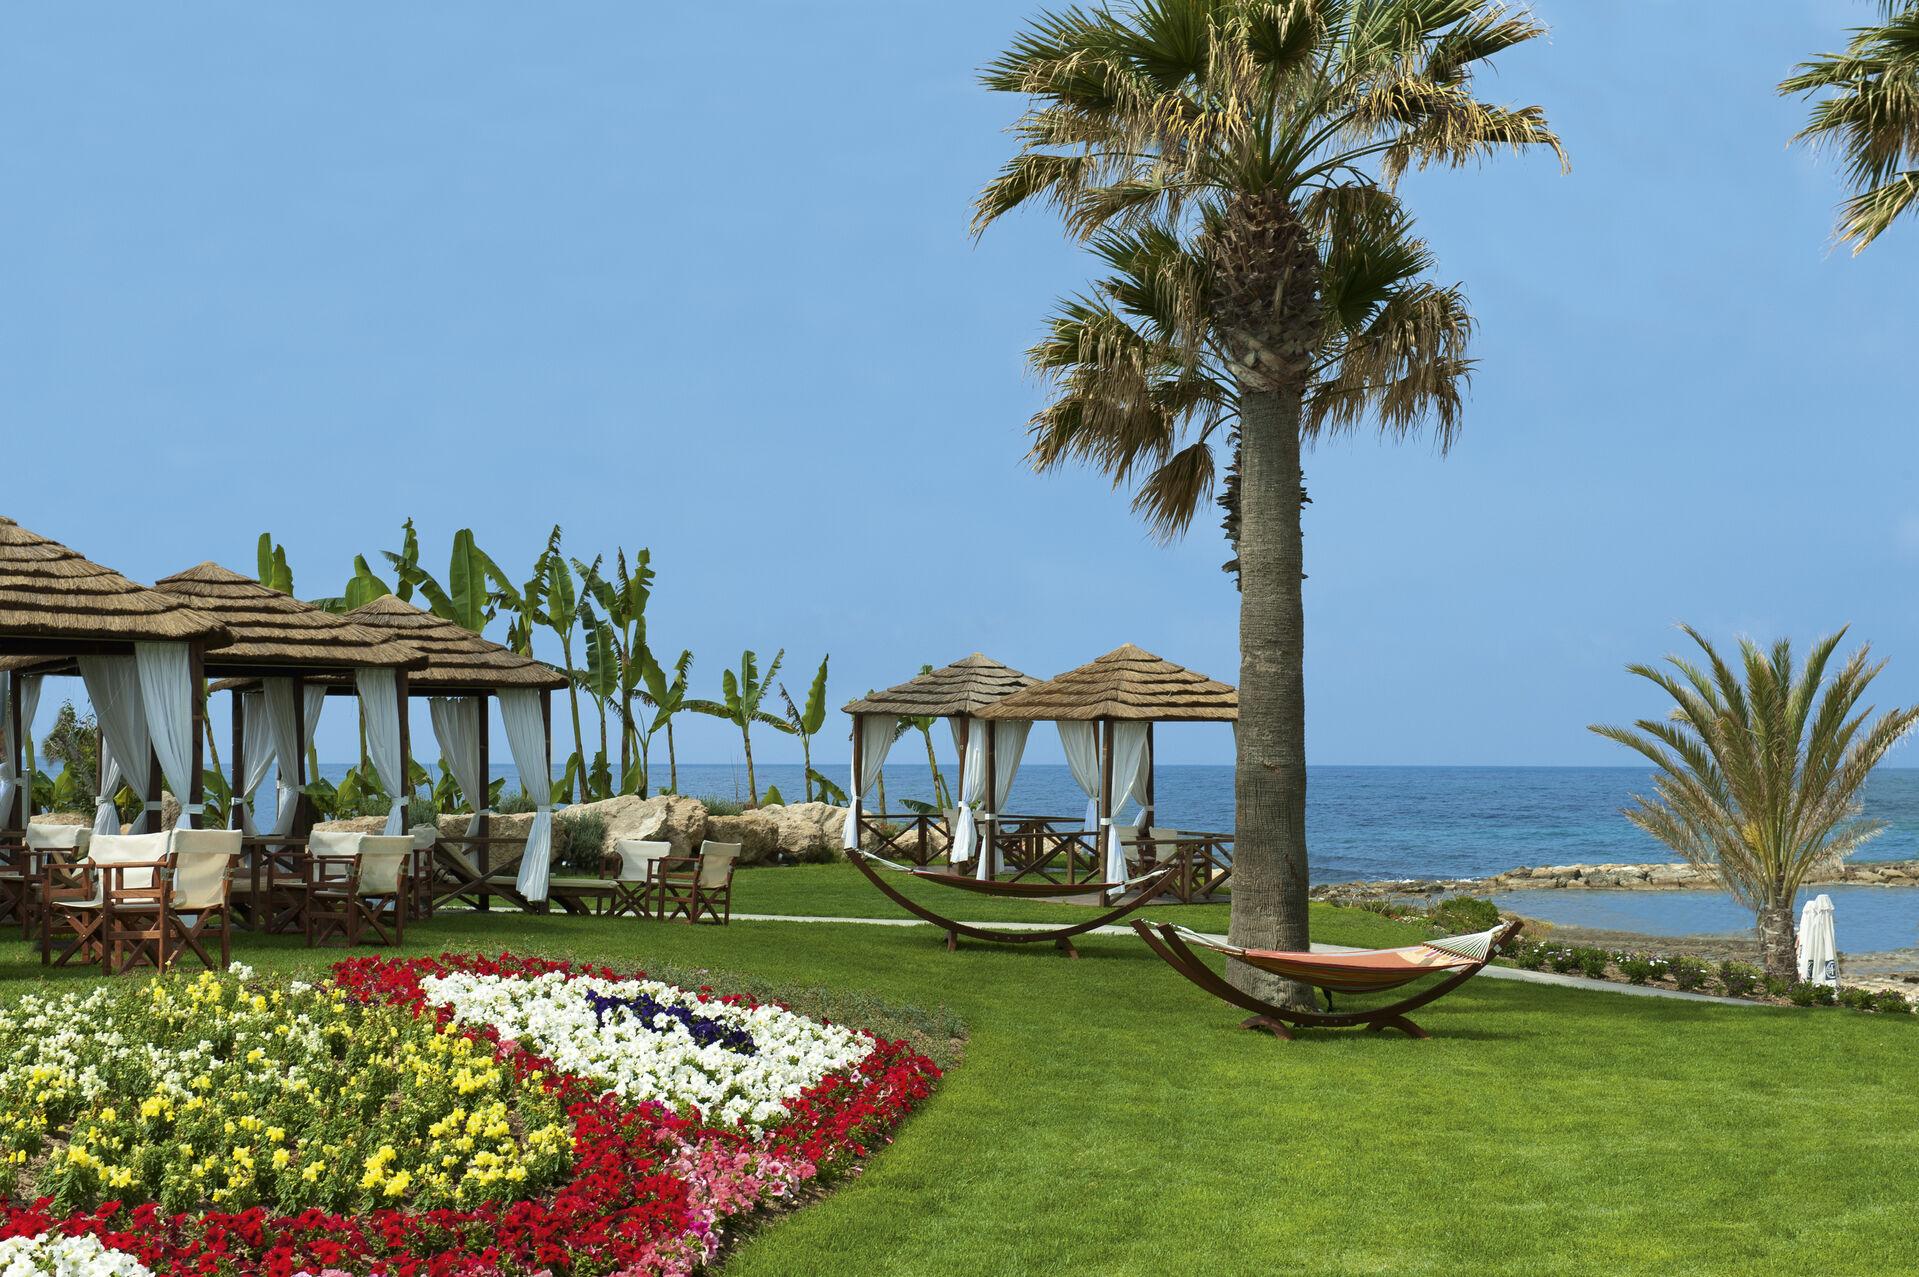 https://cms.satur.sk/data/imgs/tour_image/orig/07-1-pioneer-beach-hotel-cabanas-by-the-beach-1972634.jpg